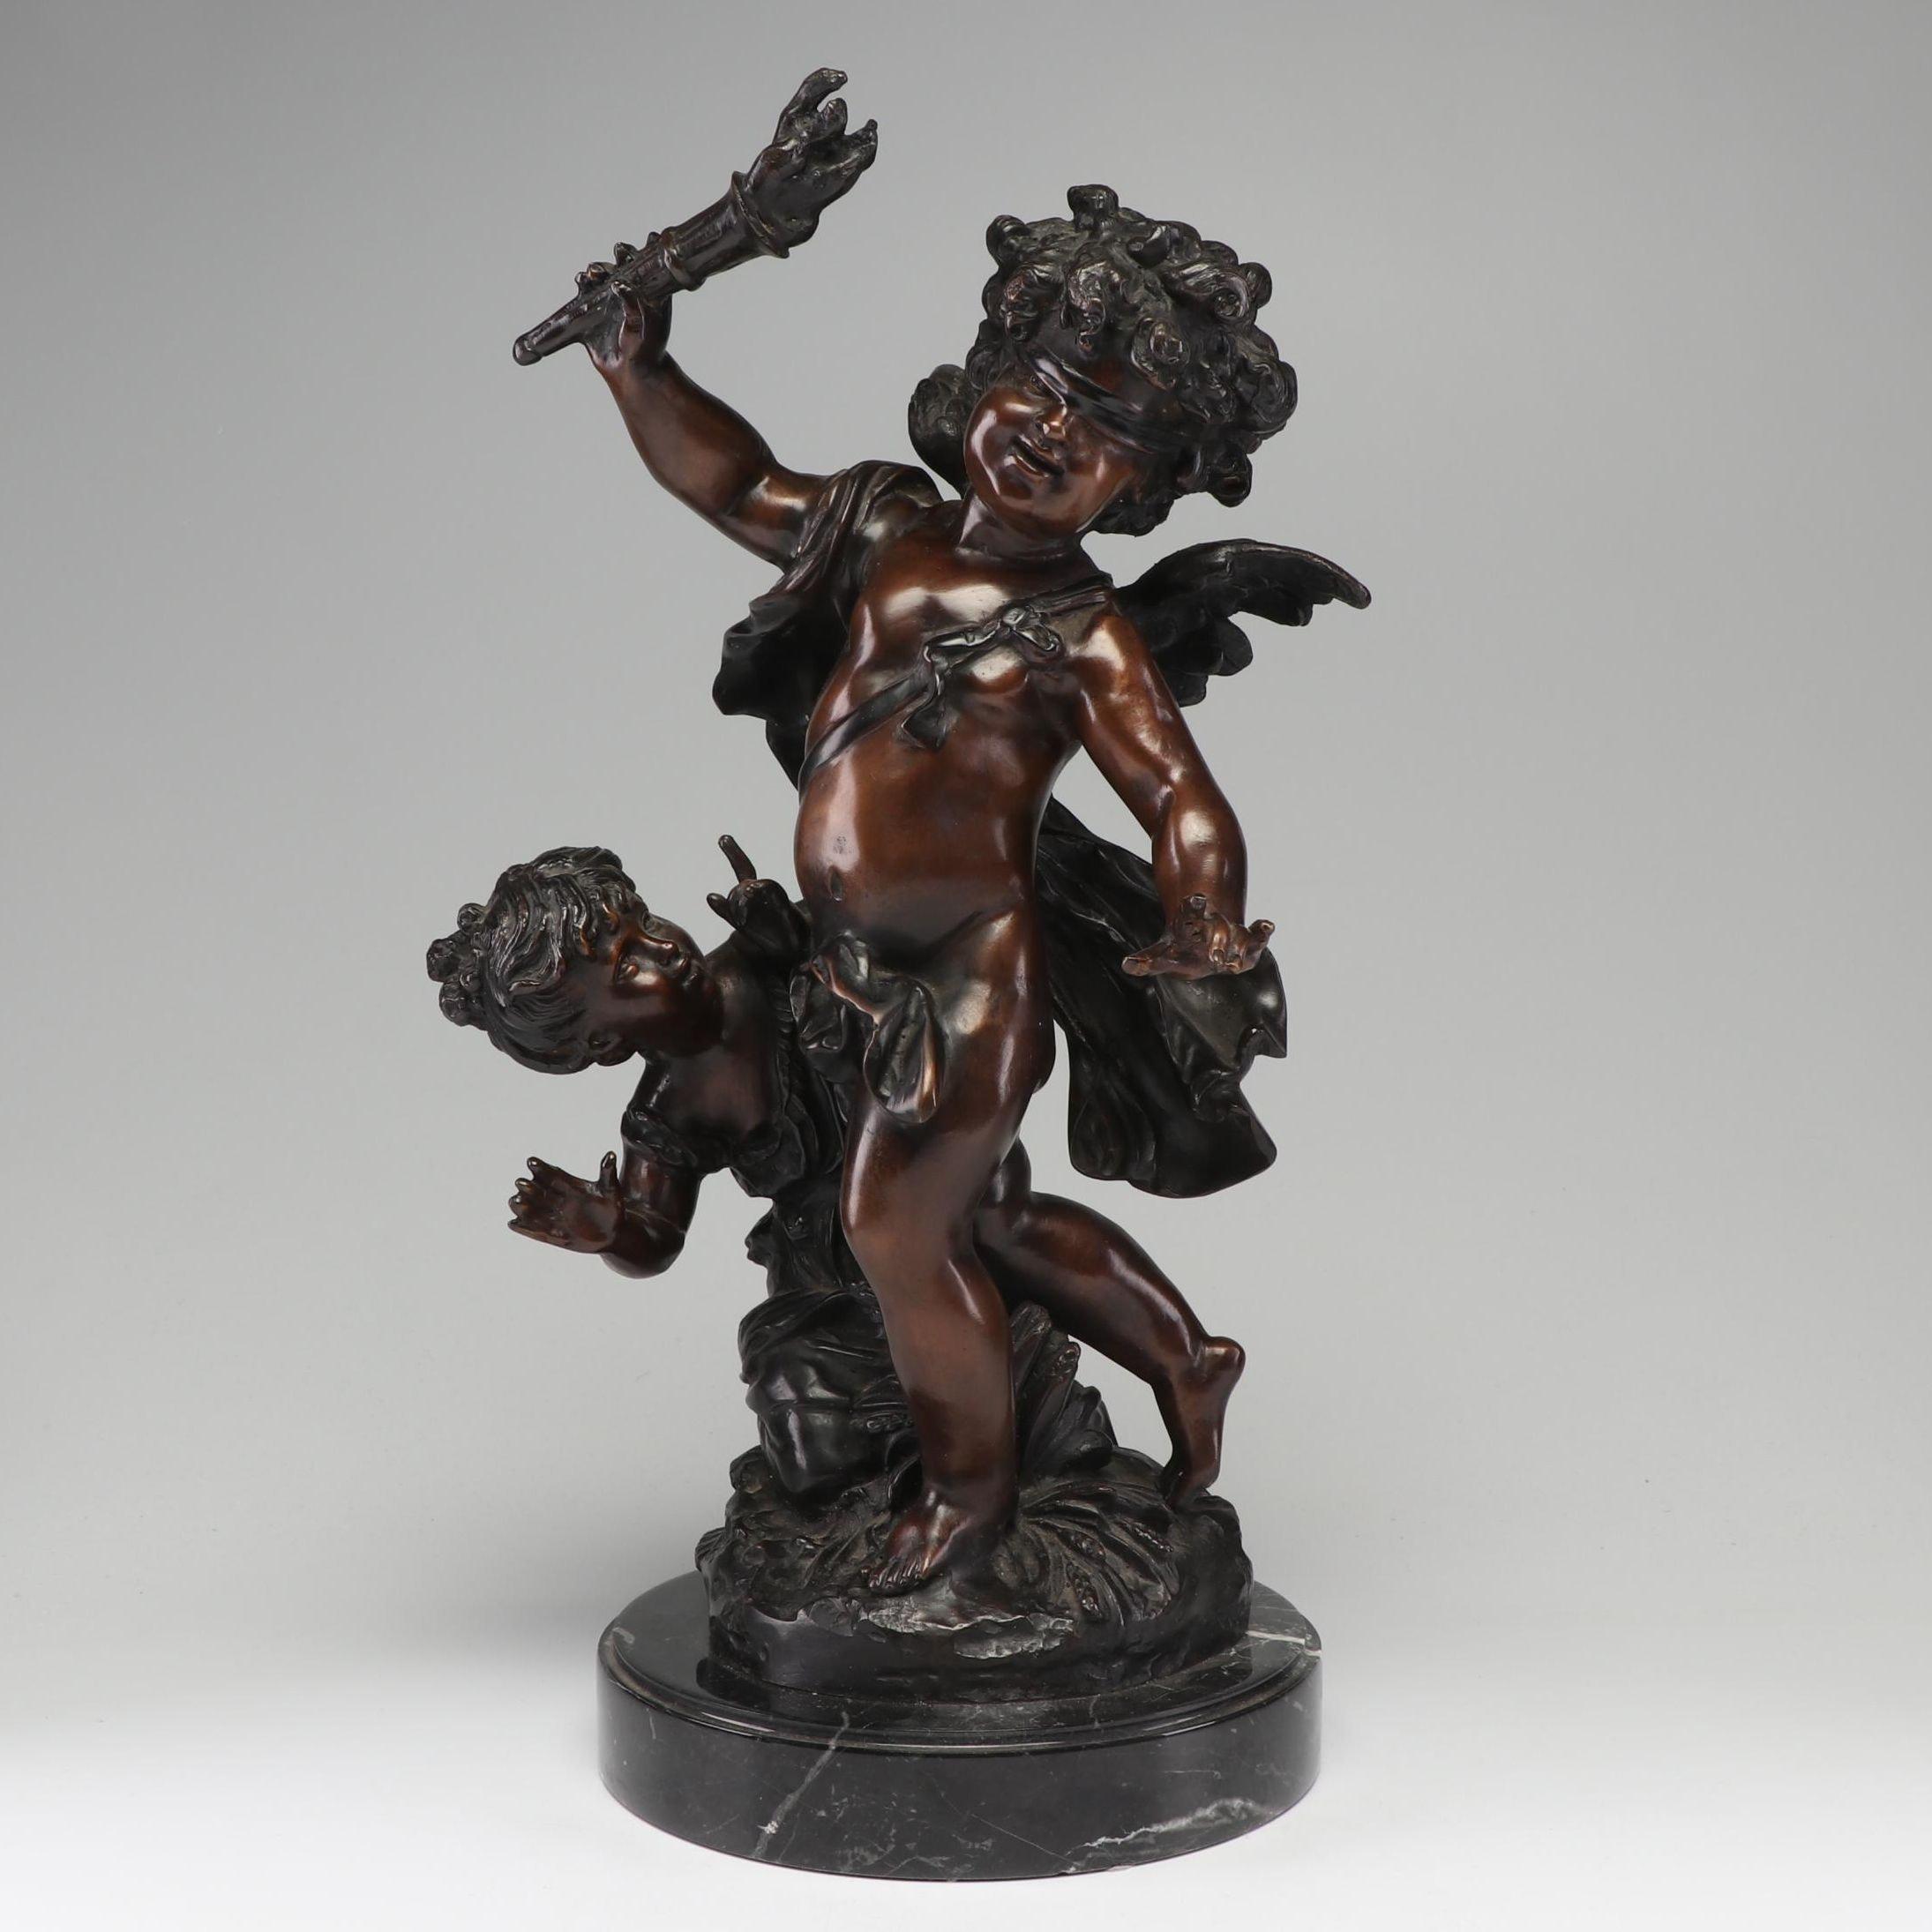 Bronze Cherub Statue on Marble Base